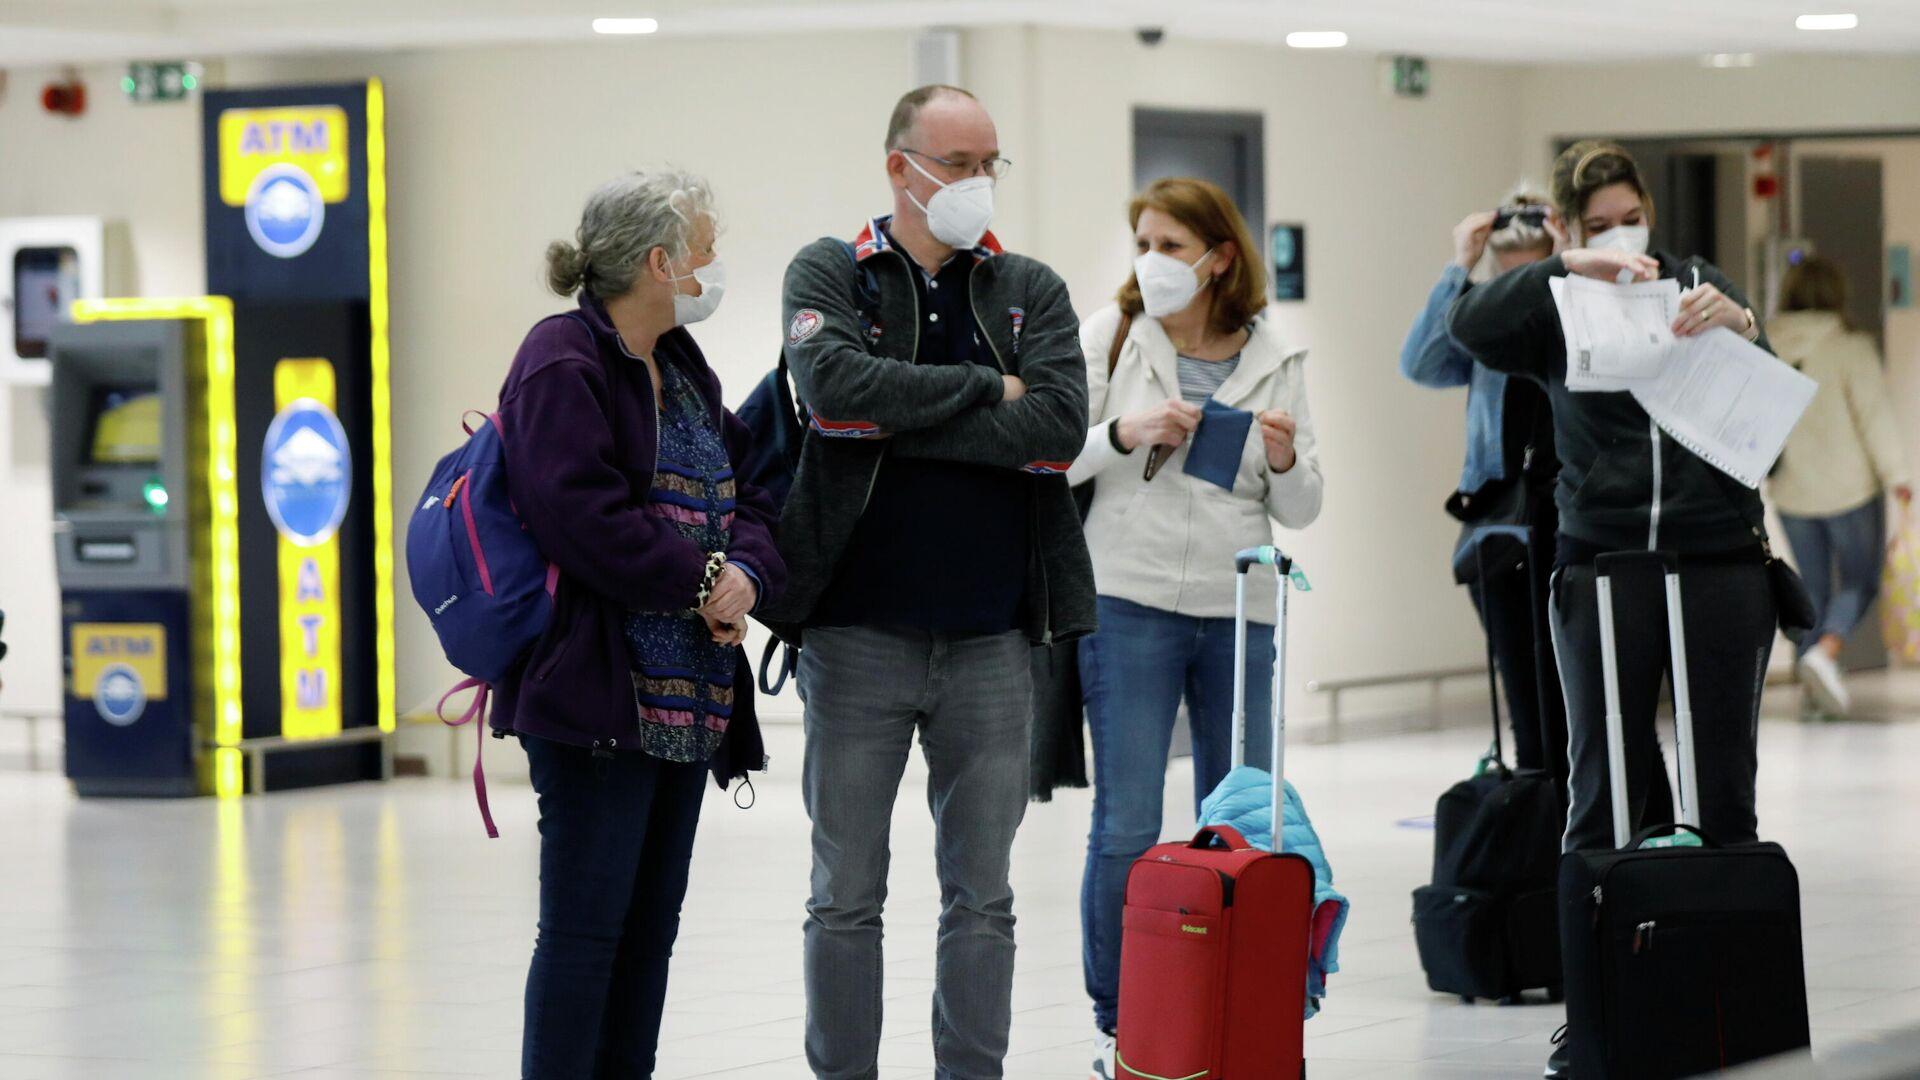 Turistas con mascarillas en un aeropuerto - Sputnik Mundo, 1920, 14.04.2021